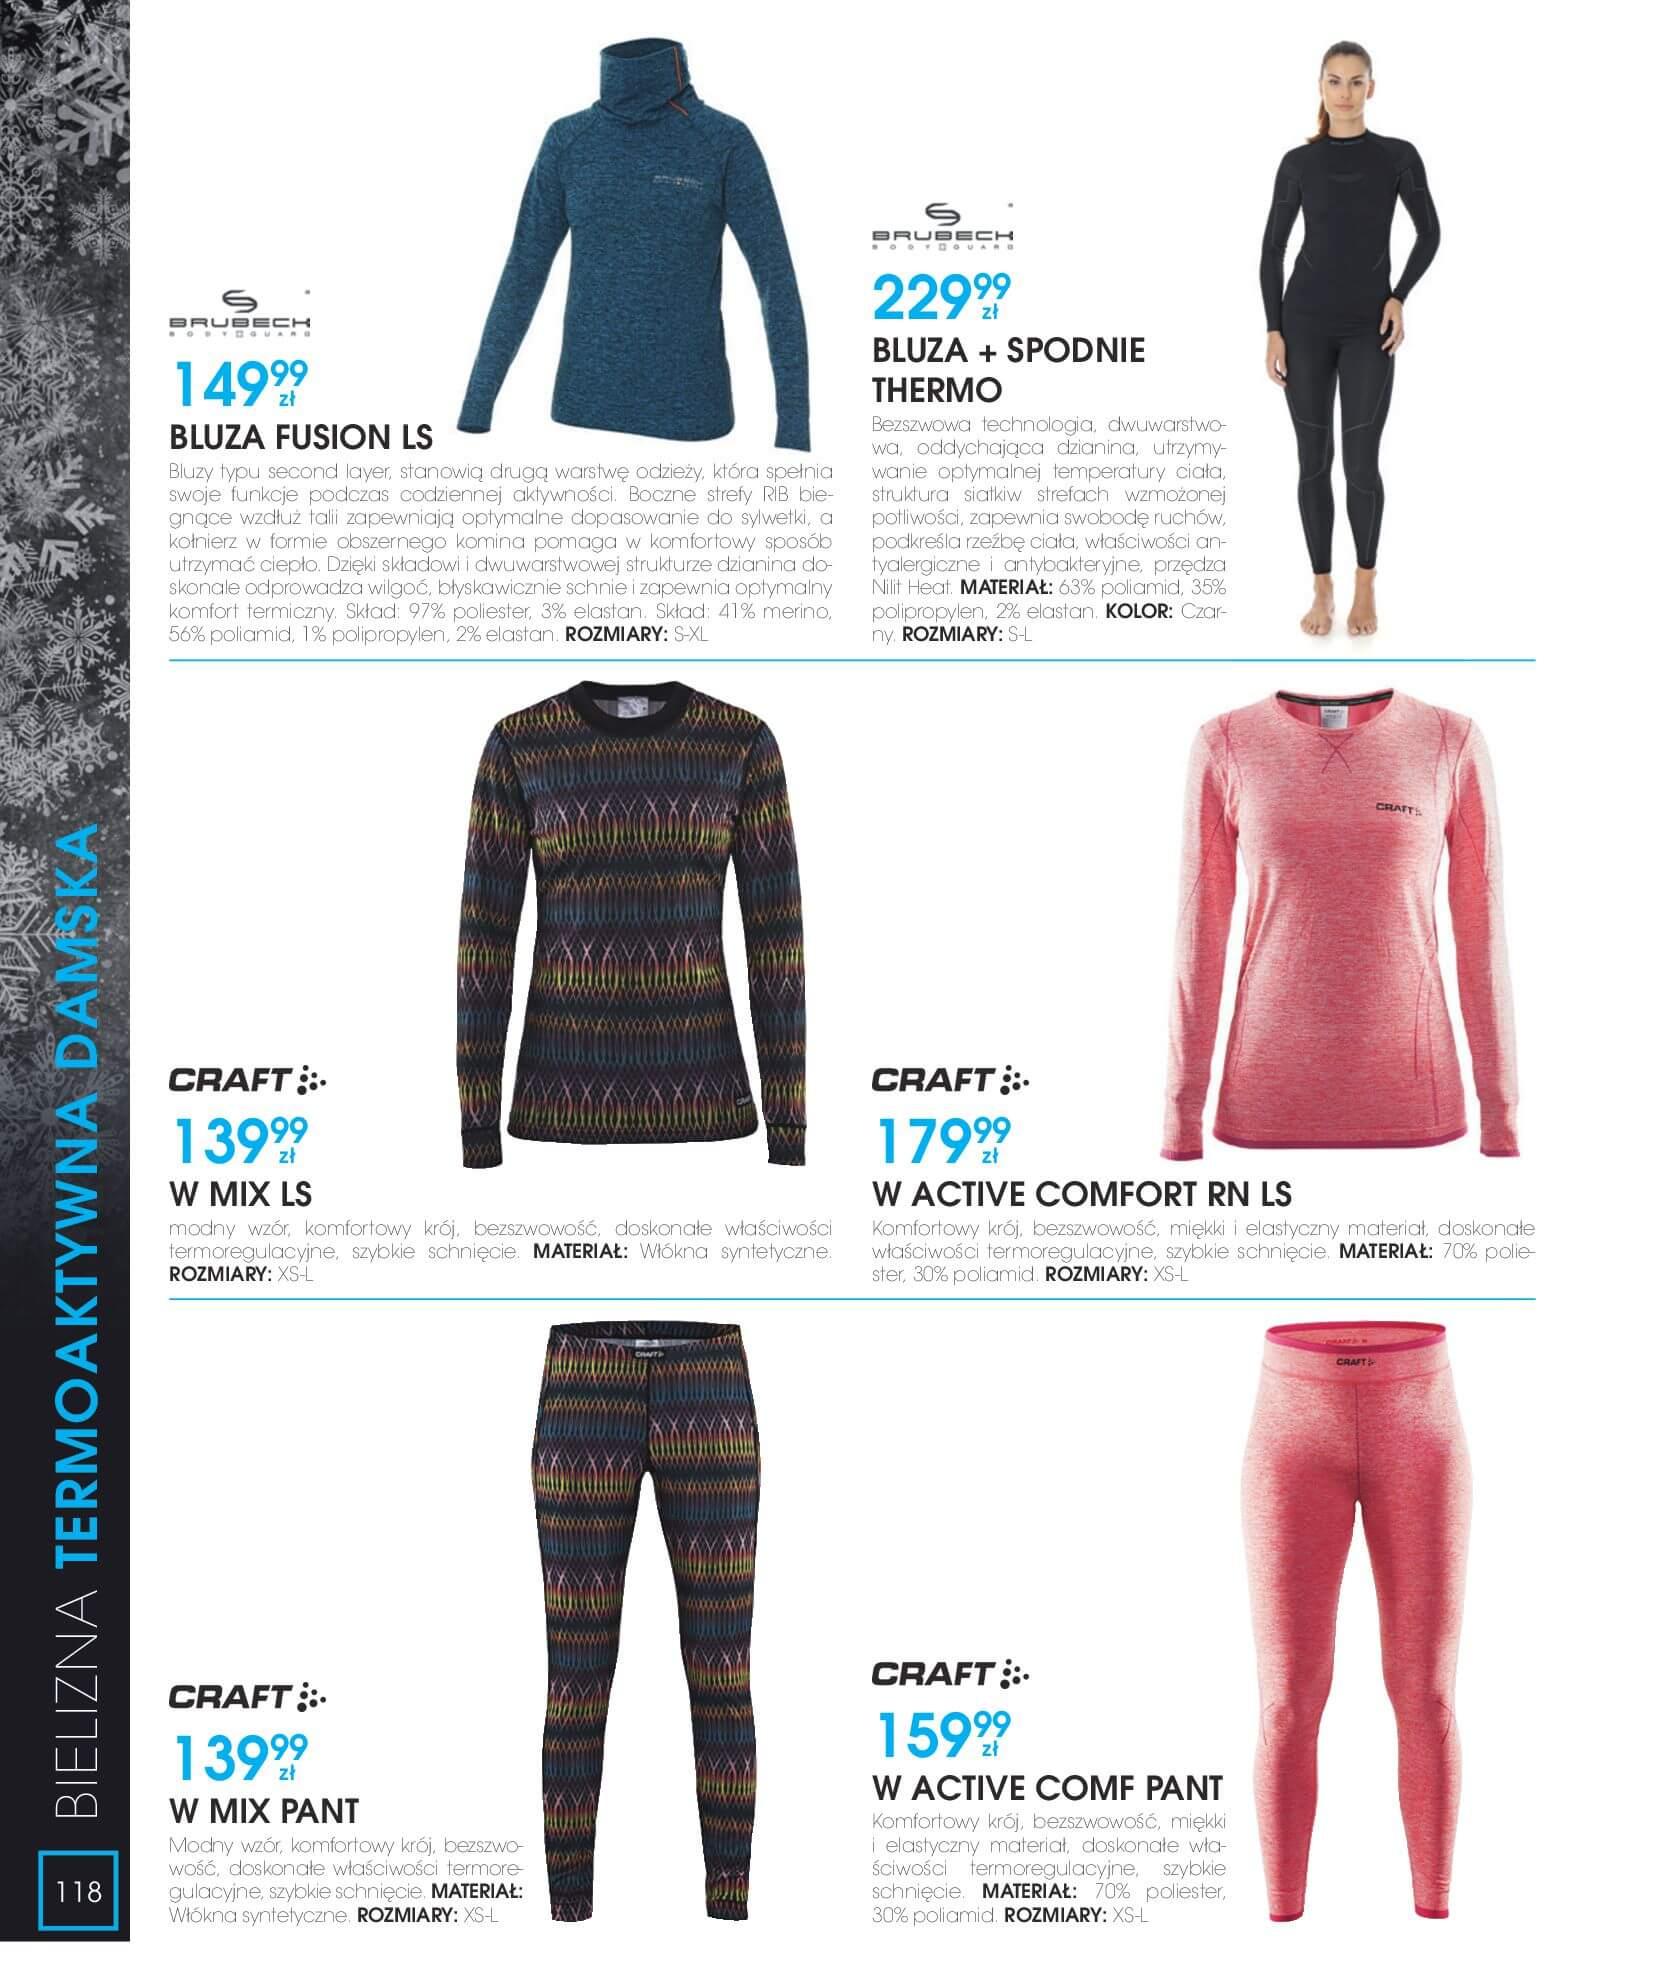 Gazetka Go Sport - Katalog Zima 2017/2018-12.11.2017-28.02.2018-page-118